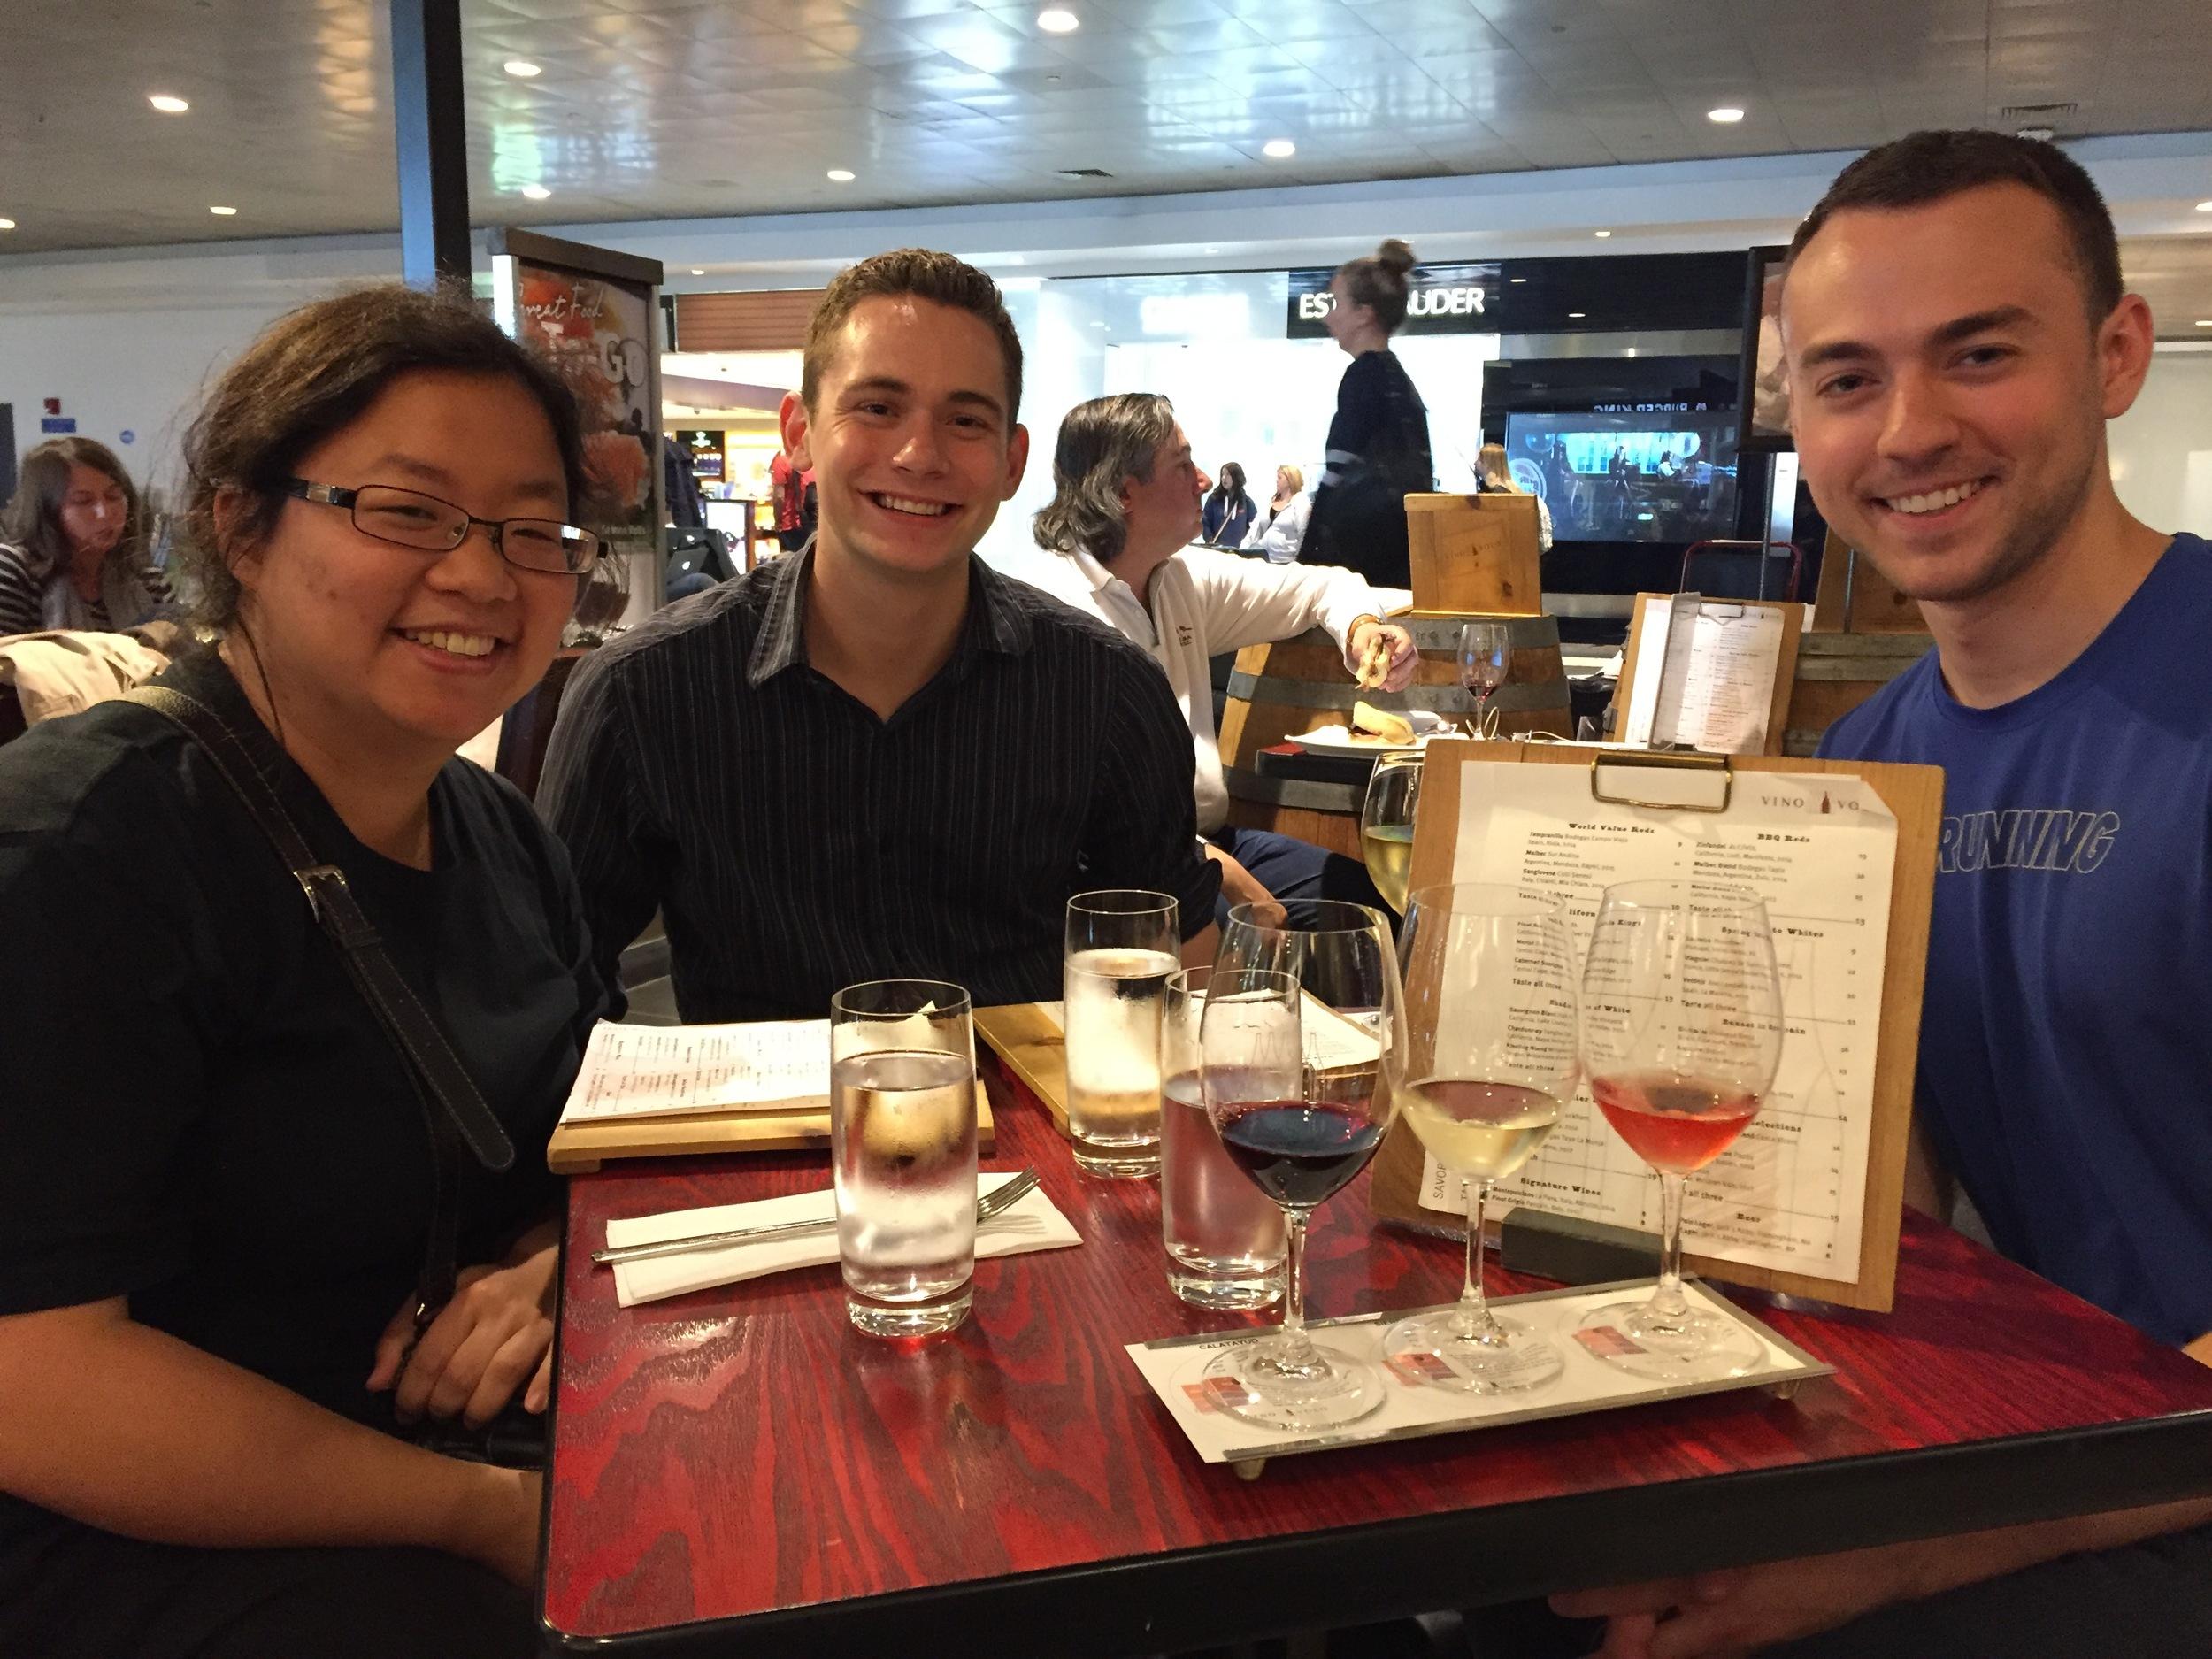 Jennifer, David, and Kade enjoying their last meal before flying from Boston en route to Copenhagen.